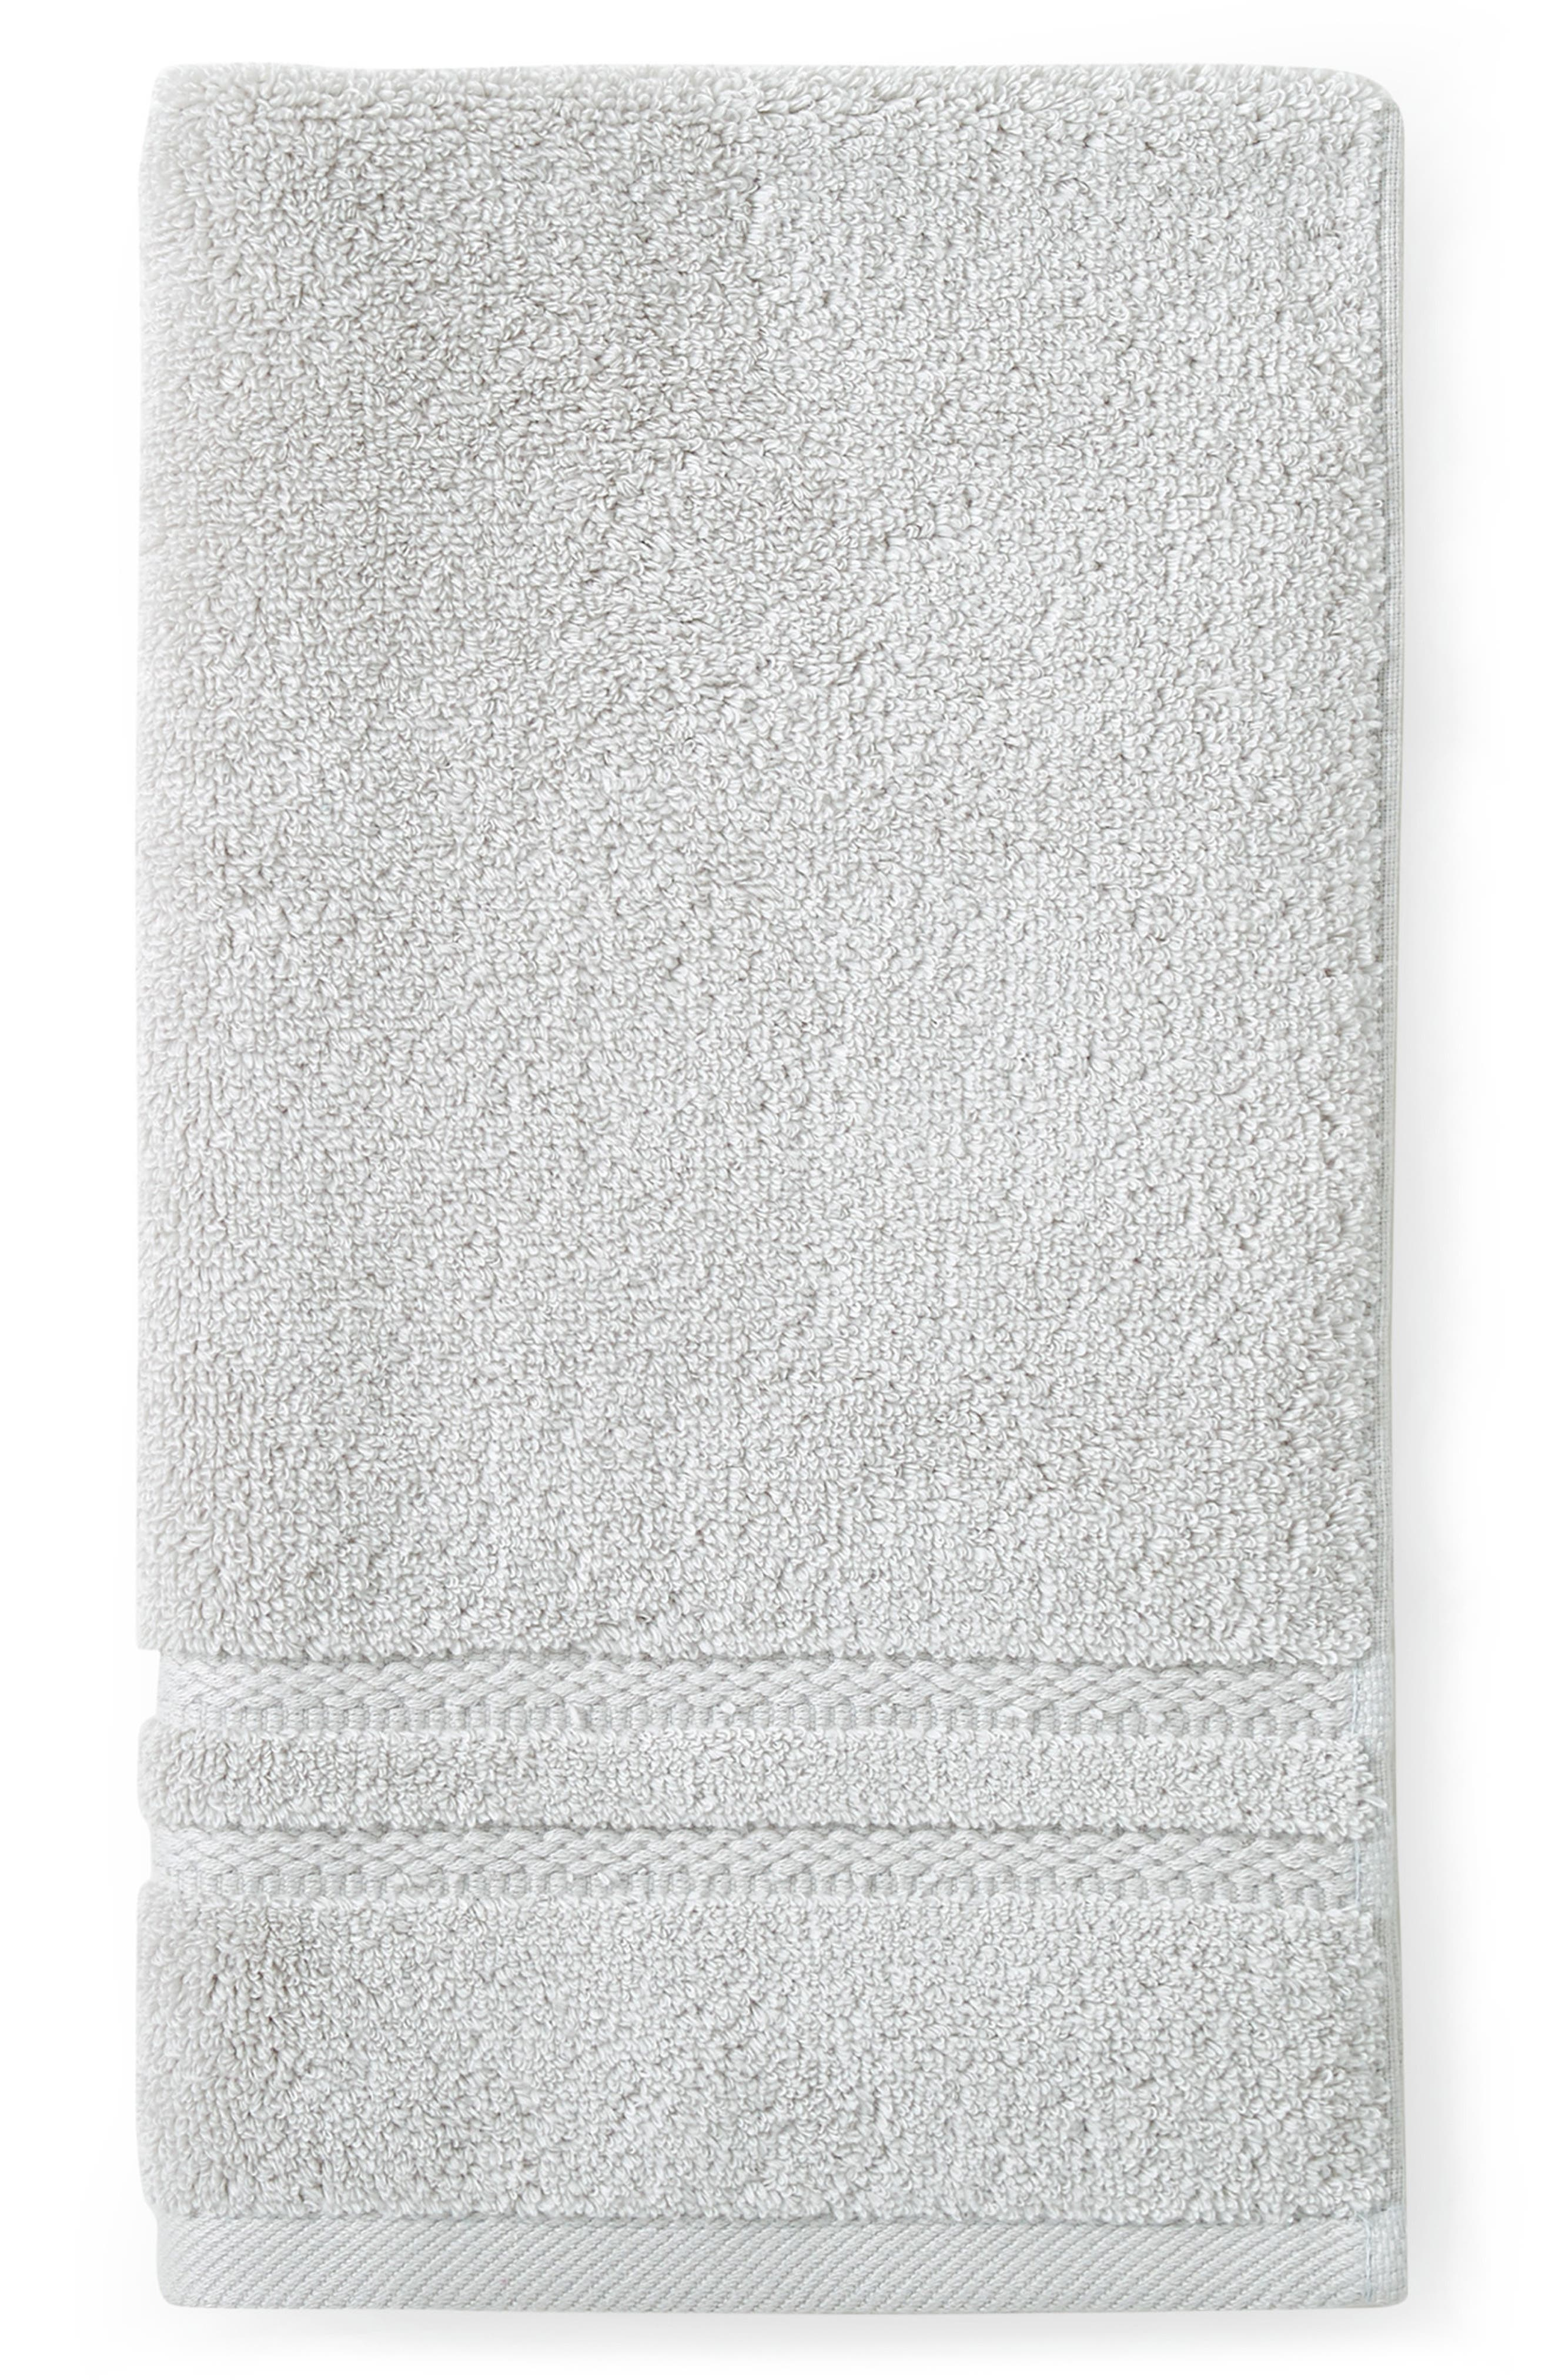 DKNY Opaque Microfiber Knee High Grey Flannel 996 NEW